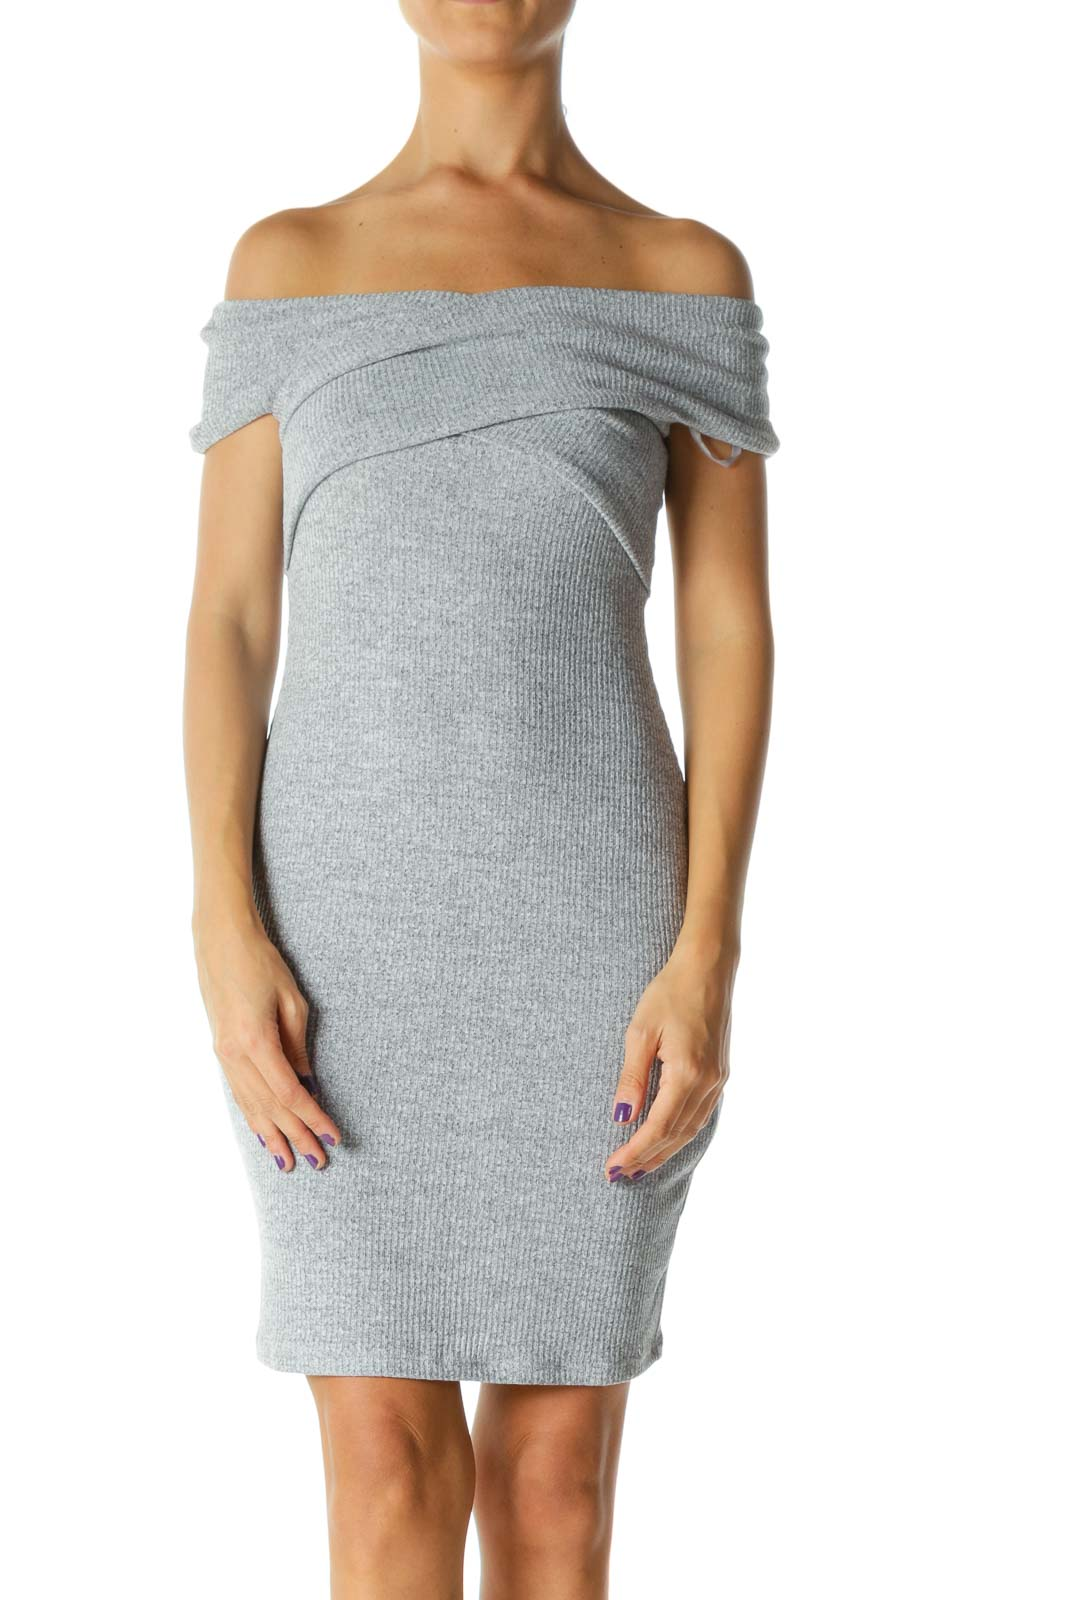 Gray Knit Bodycon Dress